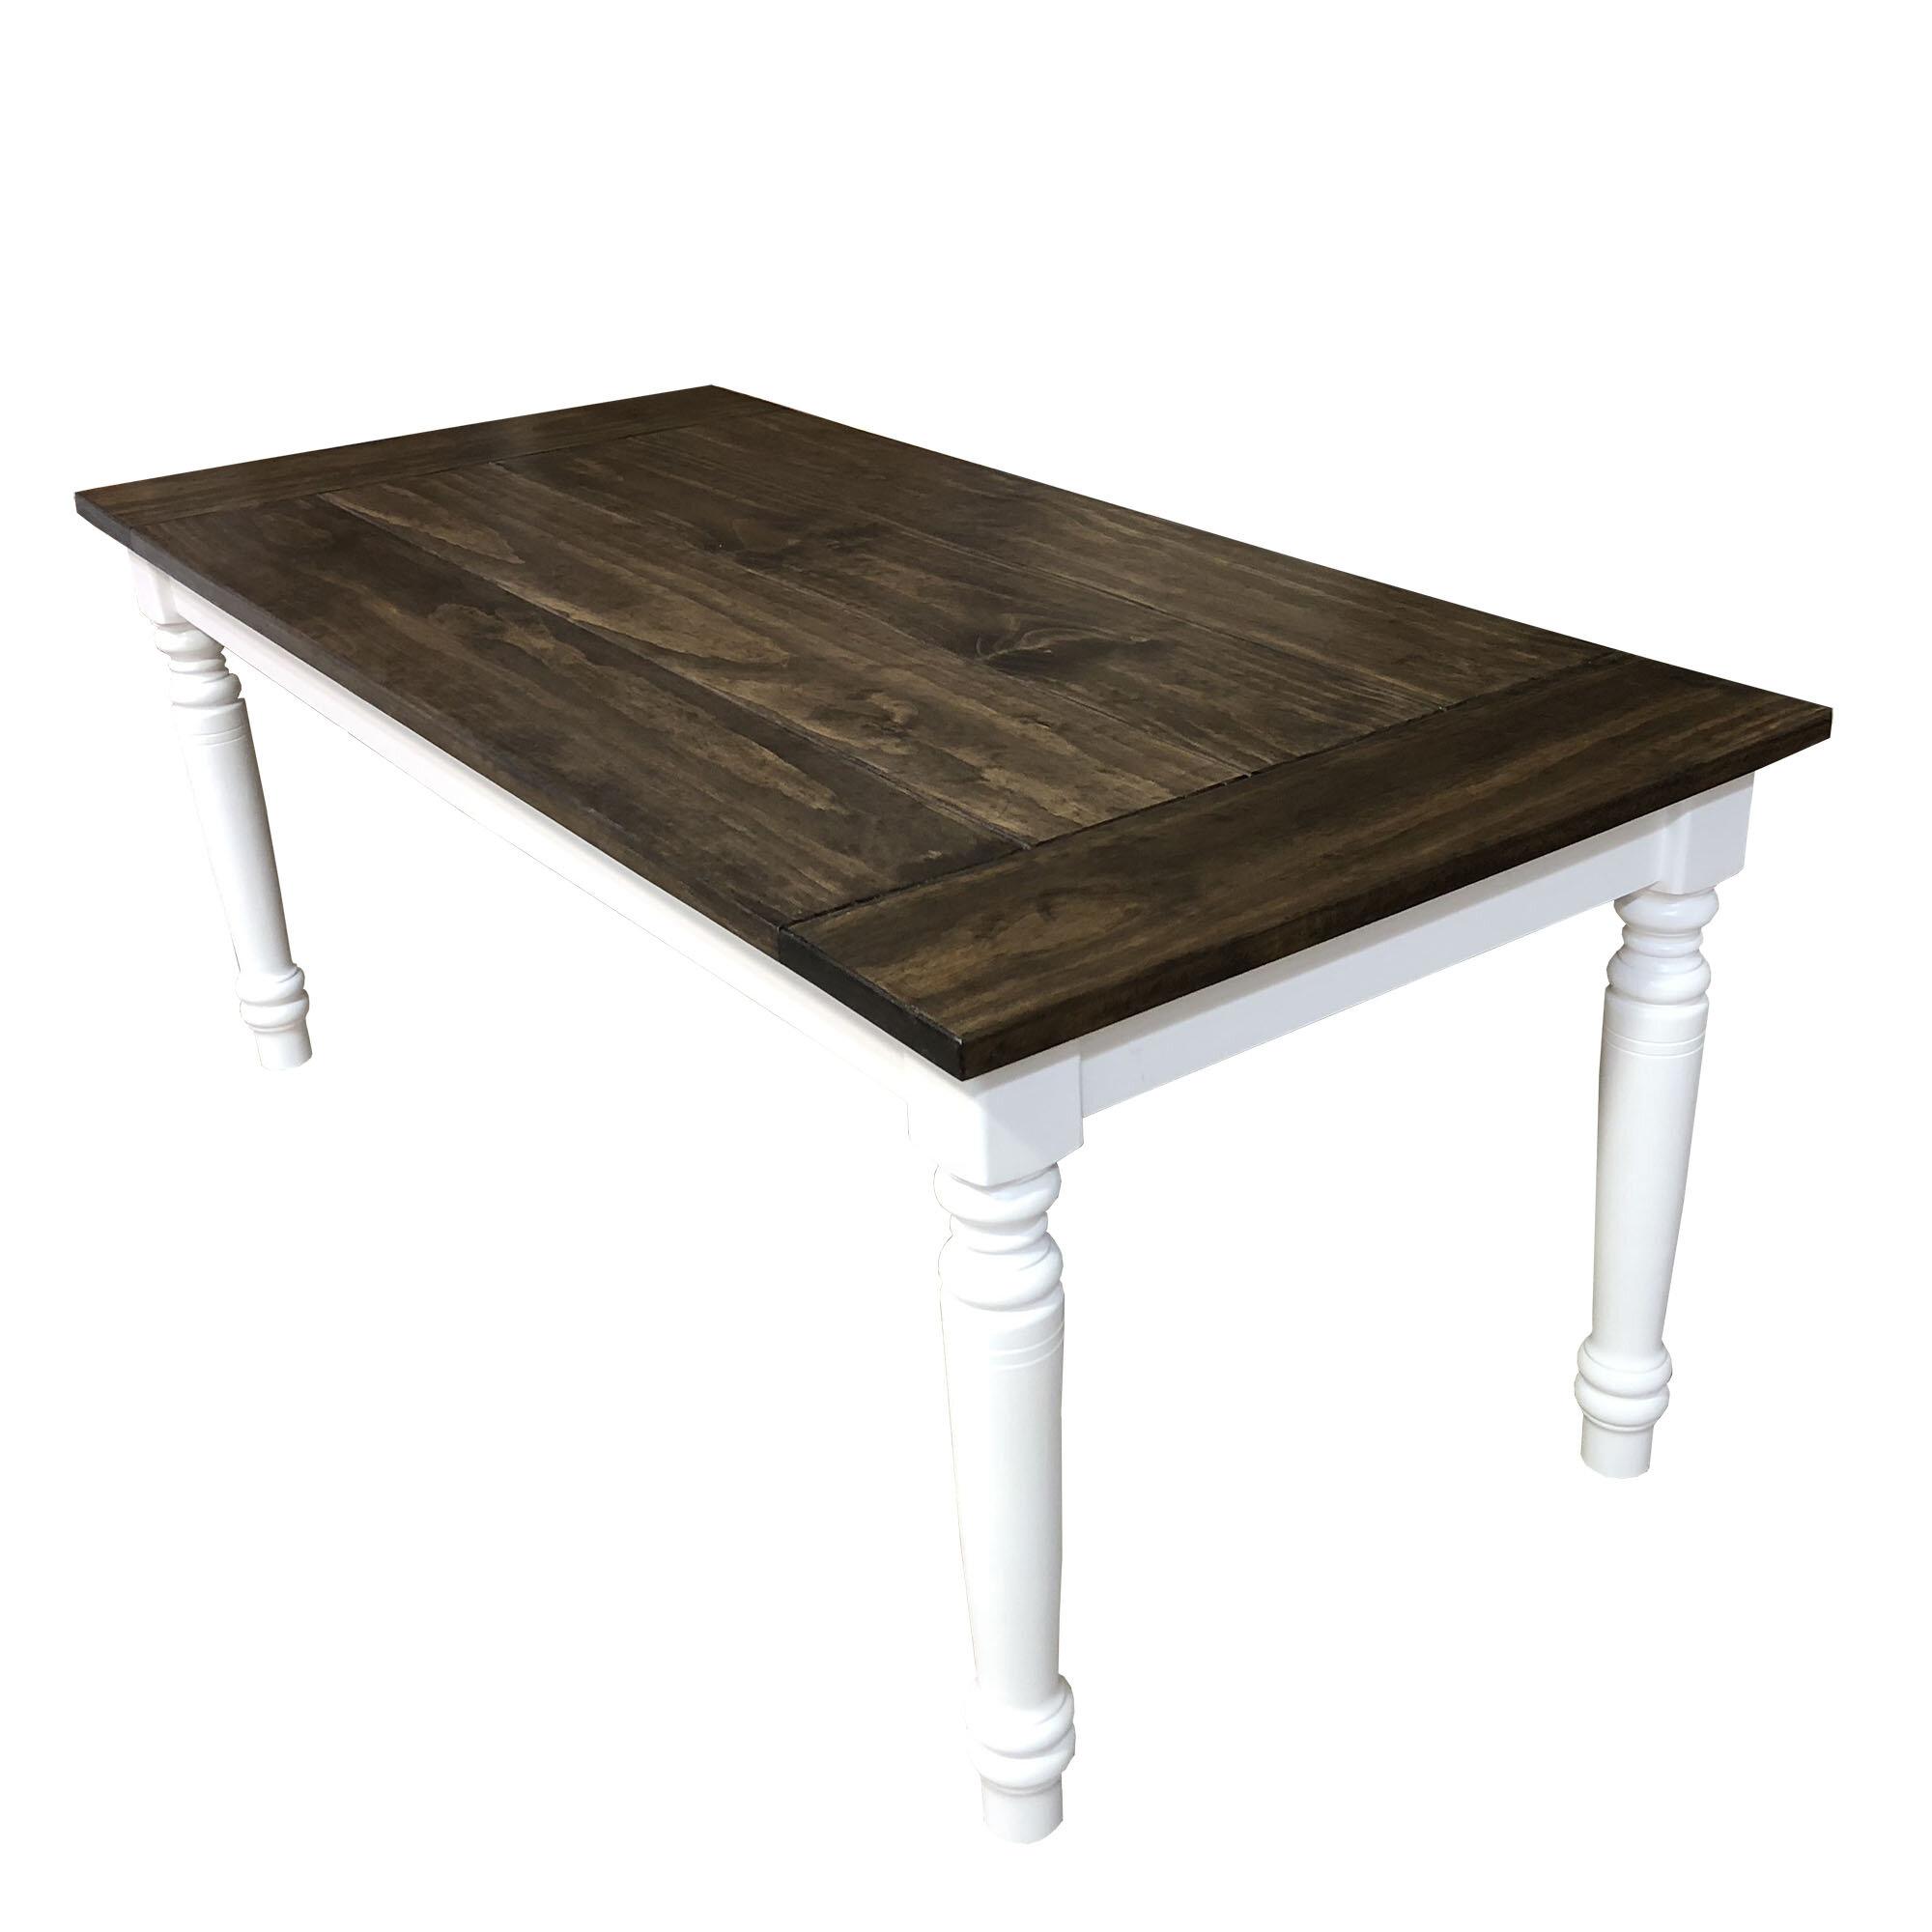 Potapchuk Fir Solid Wood Dining Table